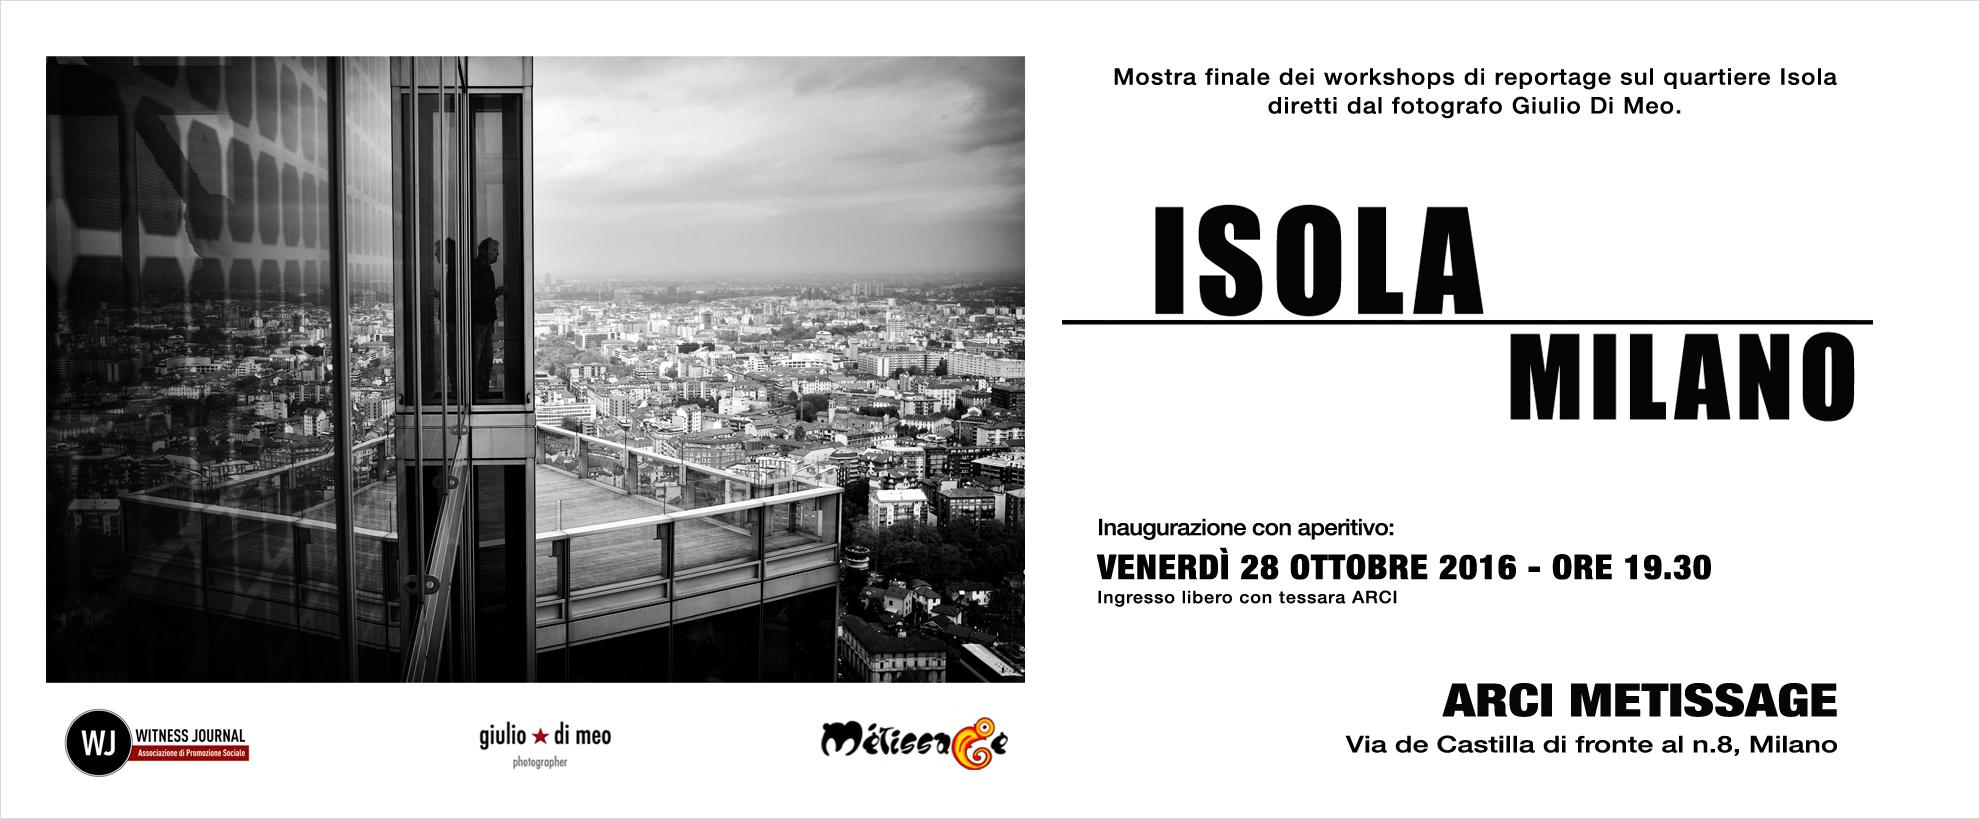 16-10-28 Mostra Milano